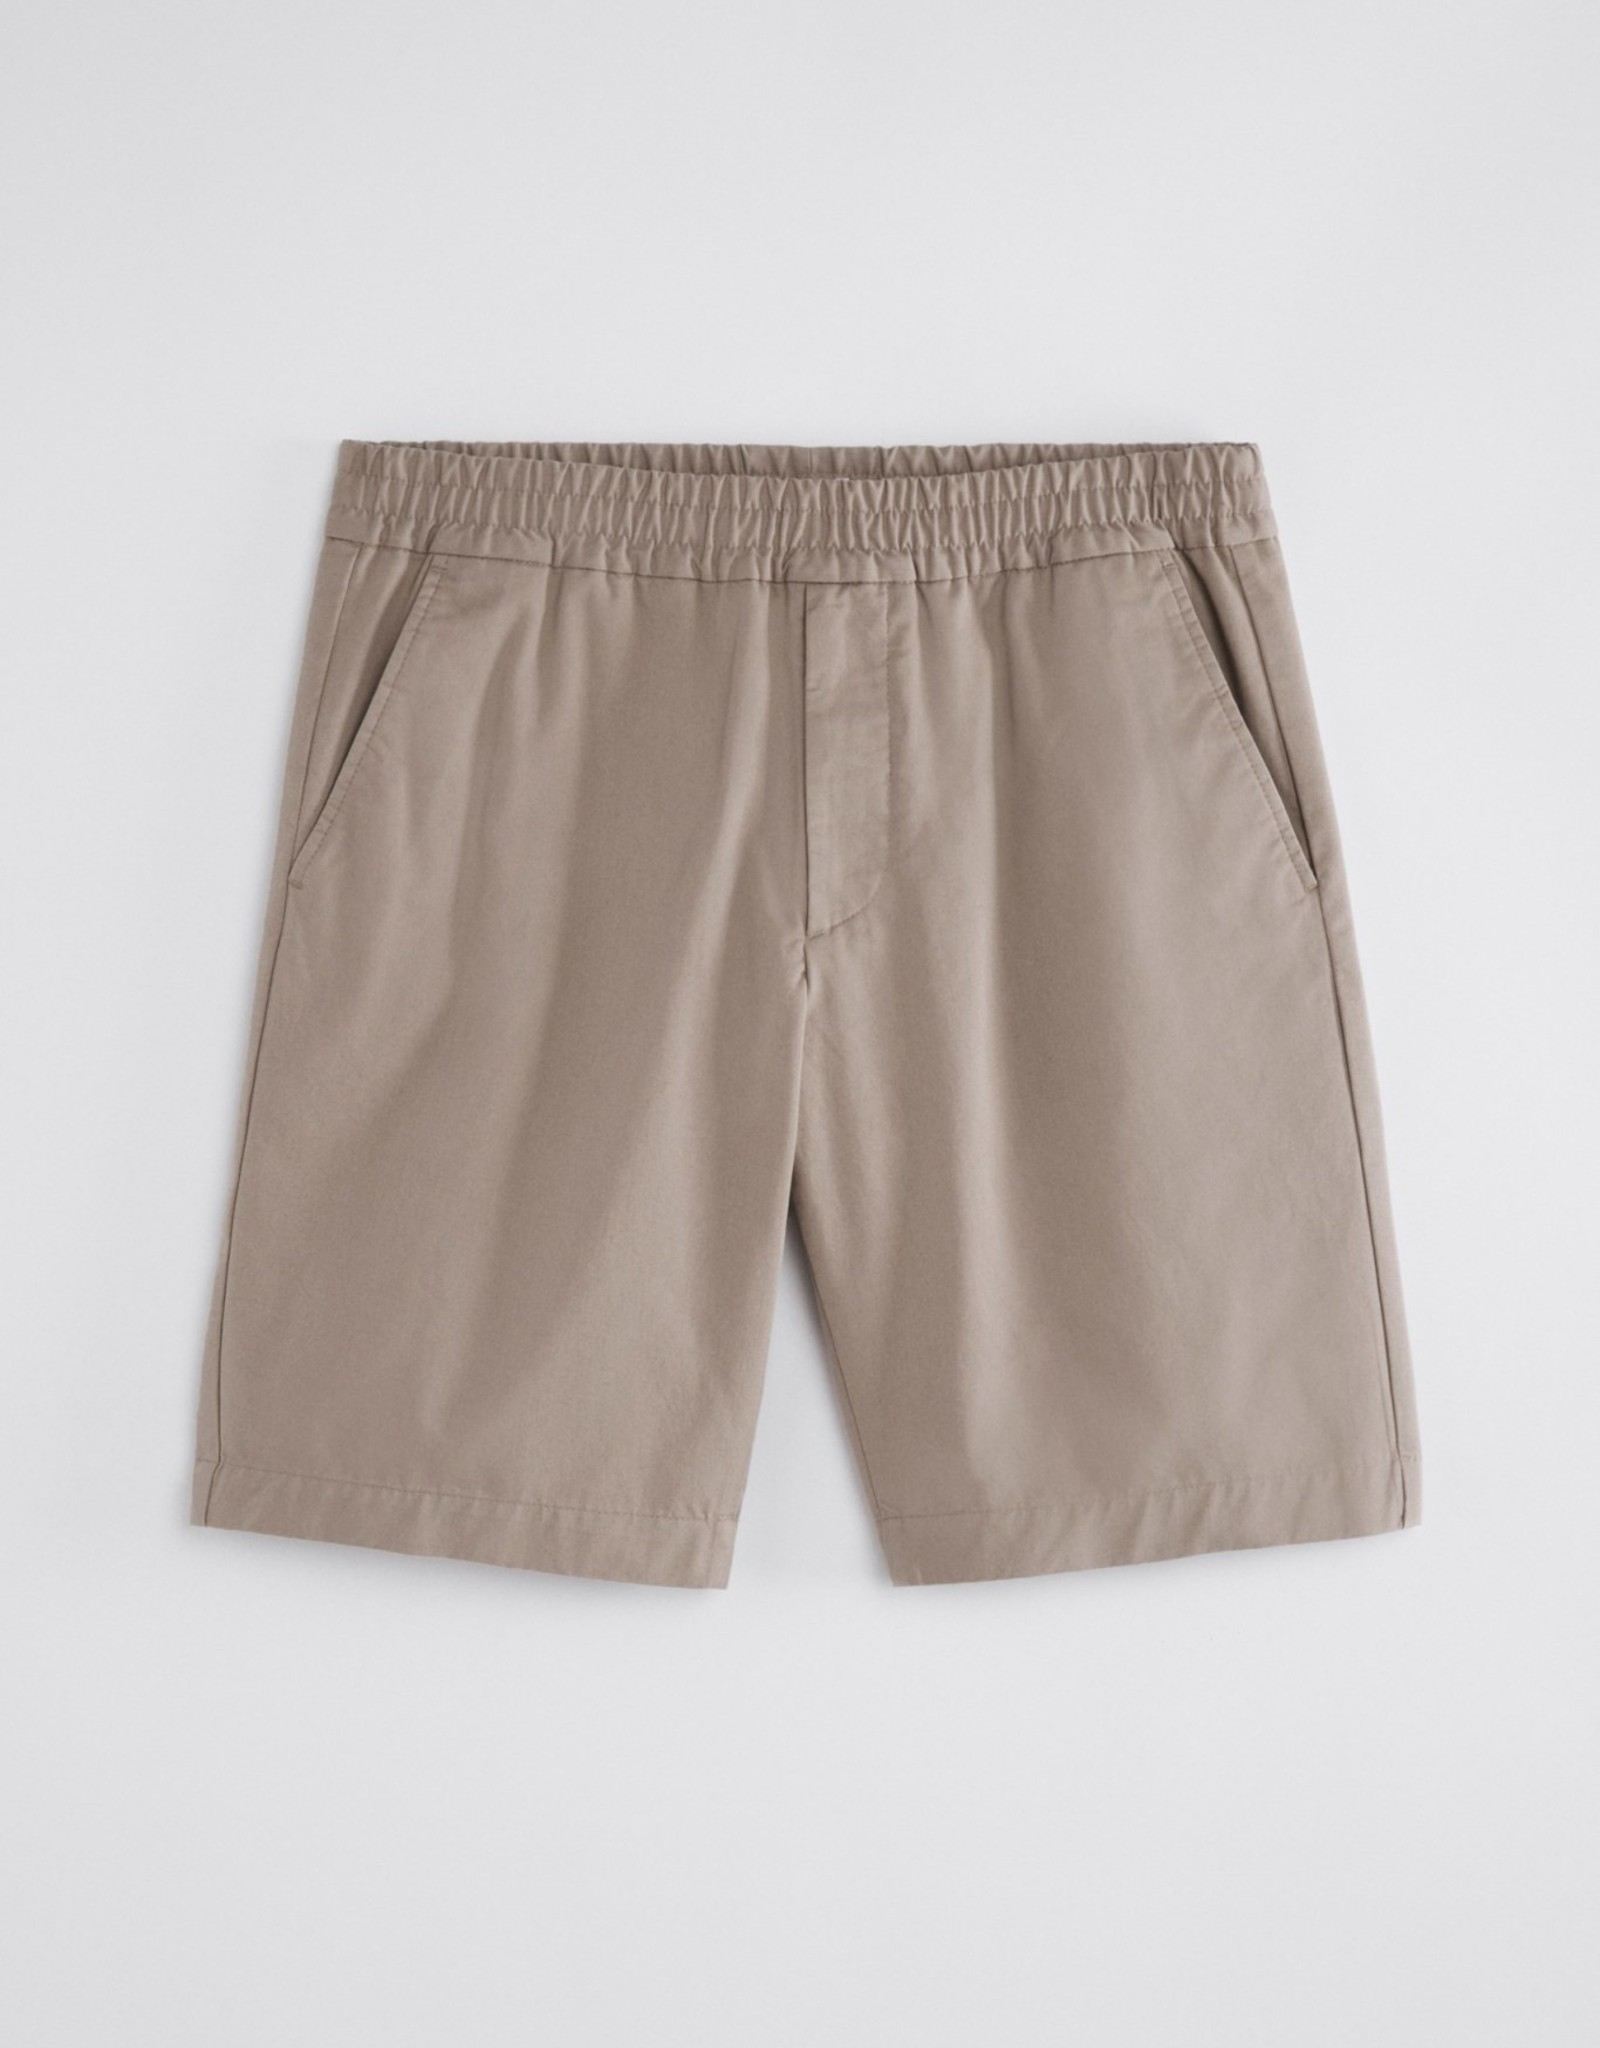 Filippa K M. Terry Cotton Shorts Desert Taupe